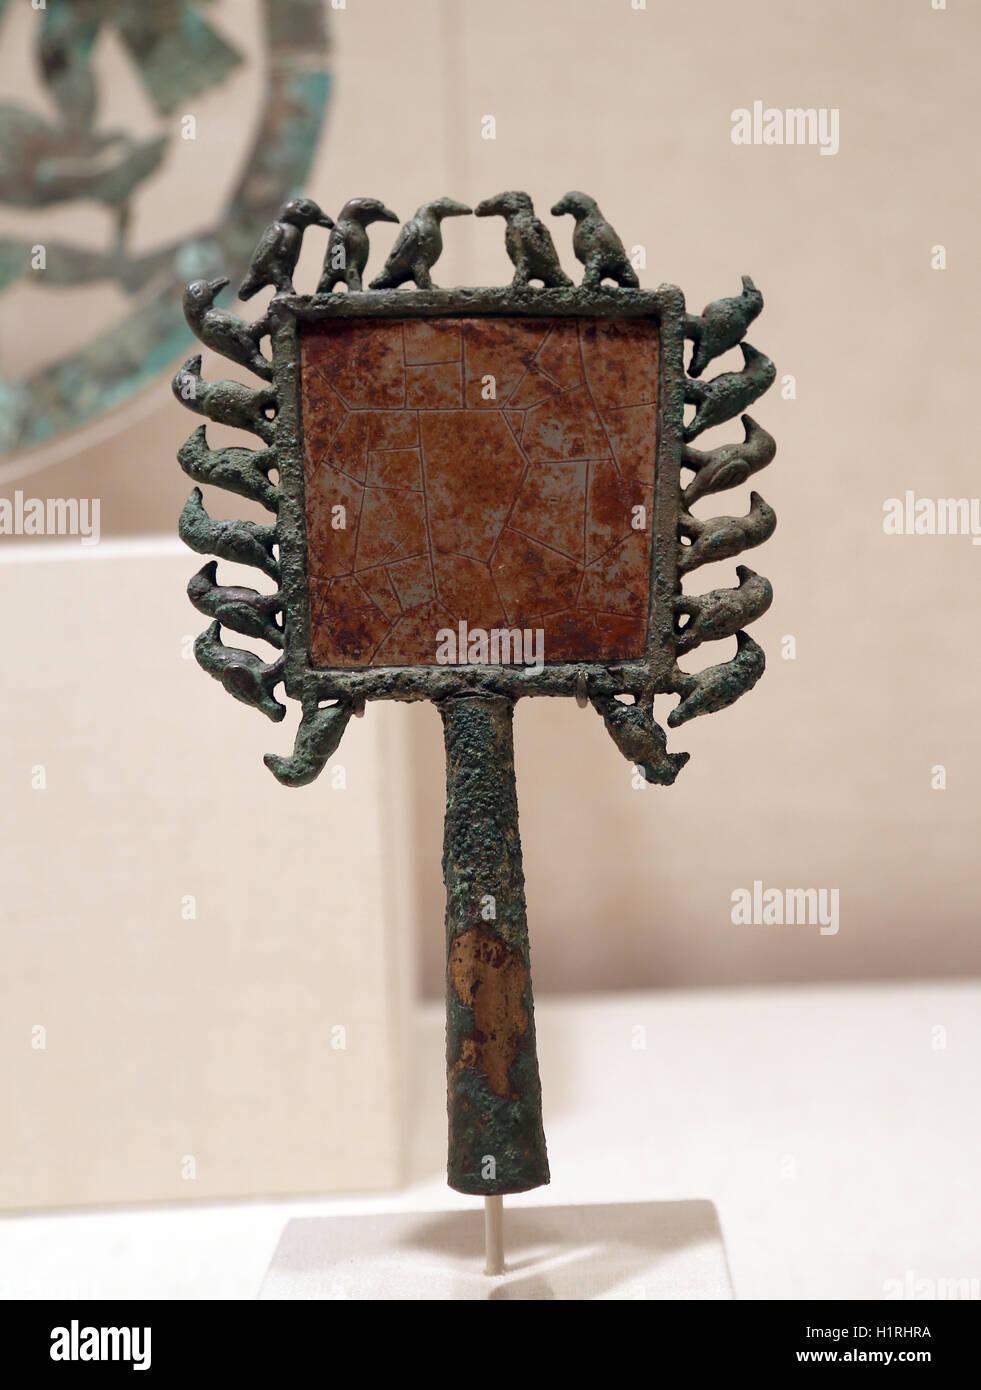 América. Perú. La cultura Moche. Espejo con aves. 2ª-7ª siglo. El cobre. Imagen De Stock